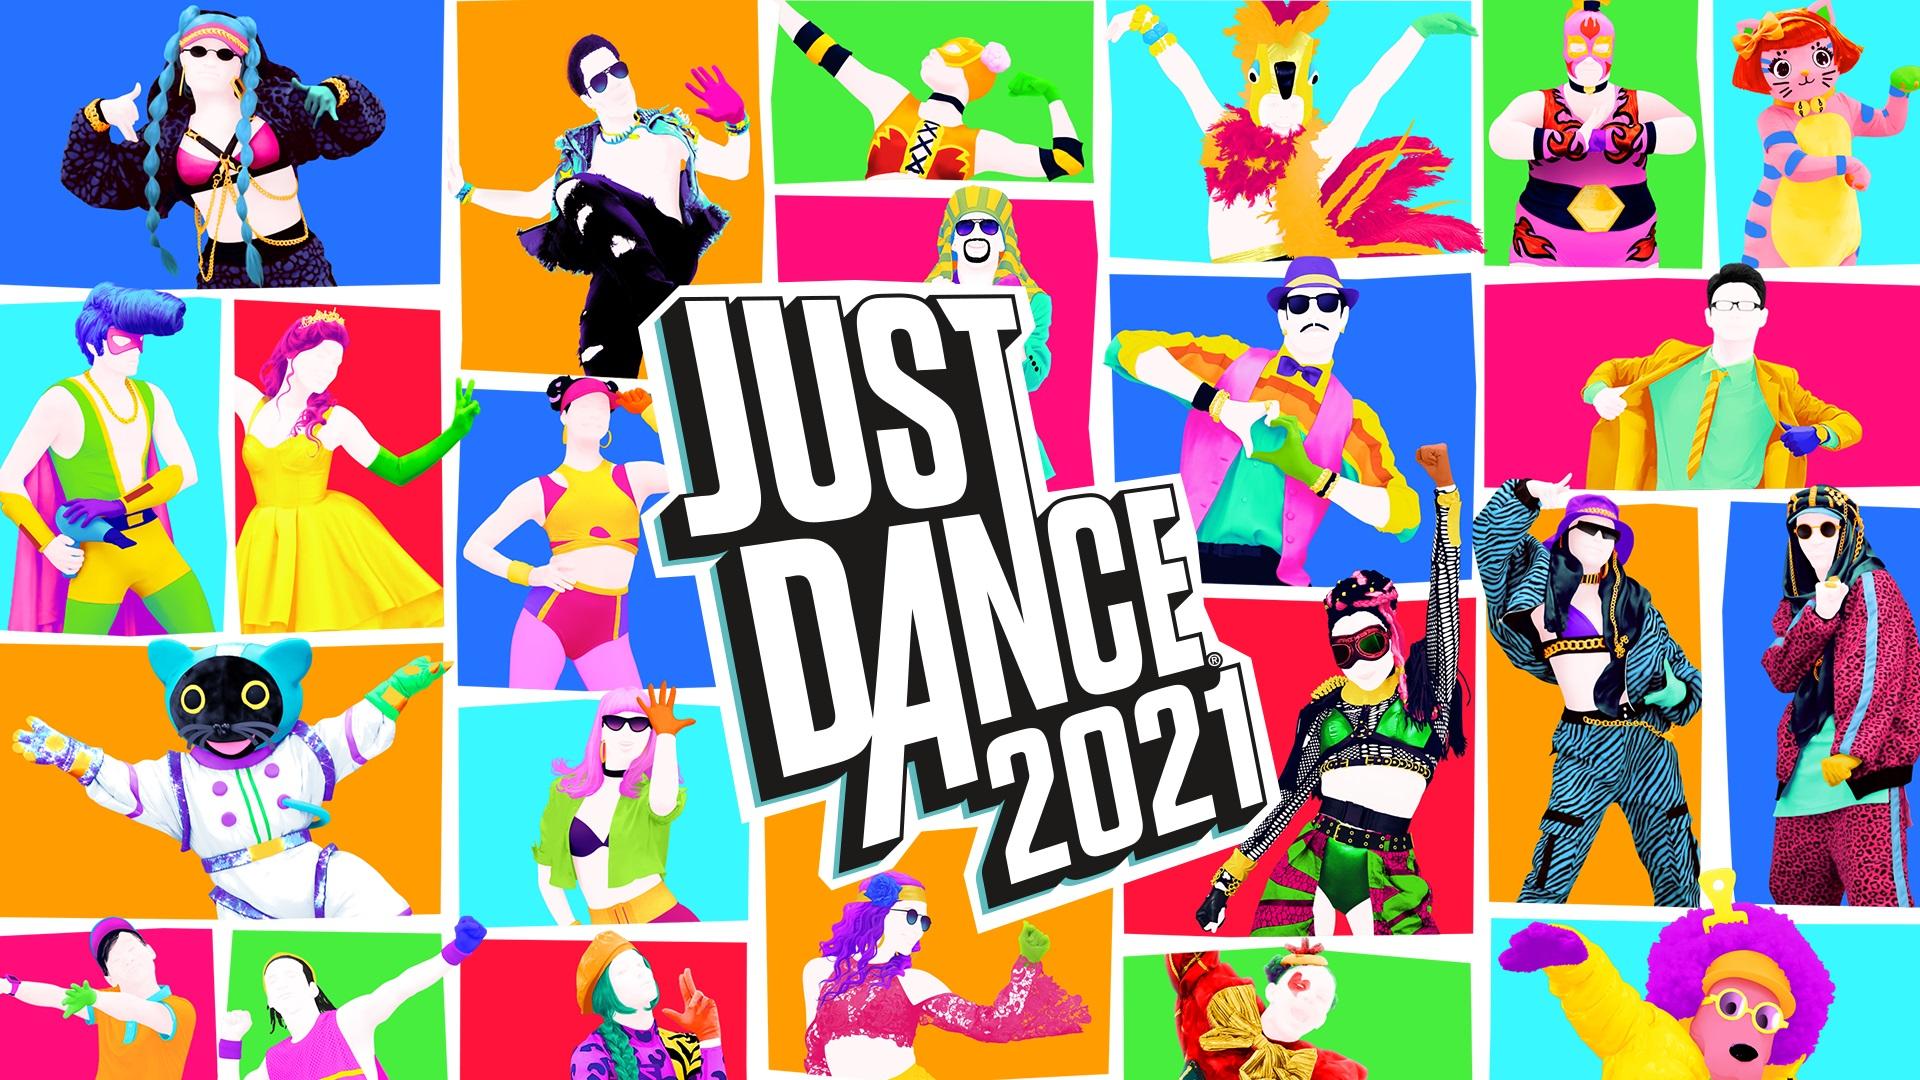 Just Dance 2021 - Nintendo Switch Digital Edition for $19.99 (Nintendo eShop)